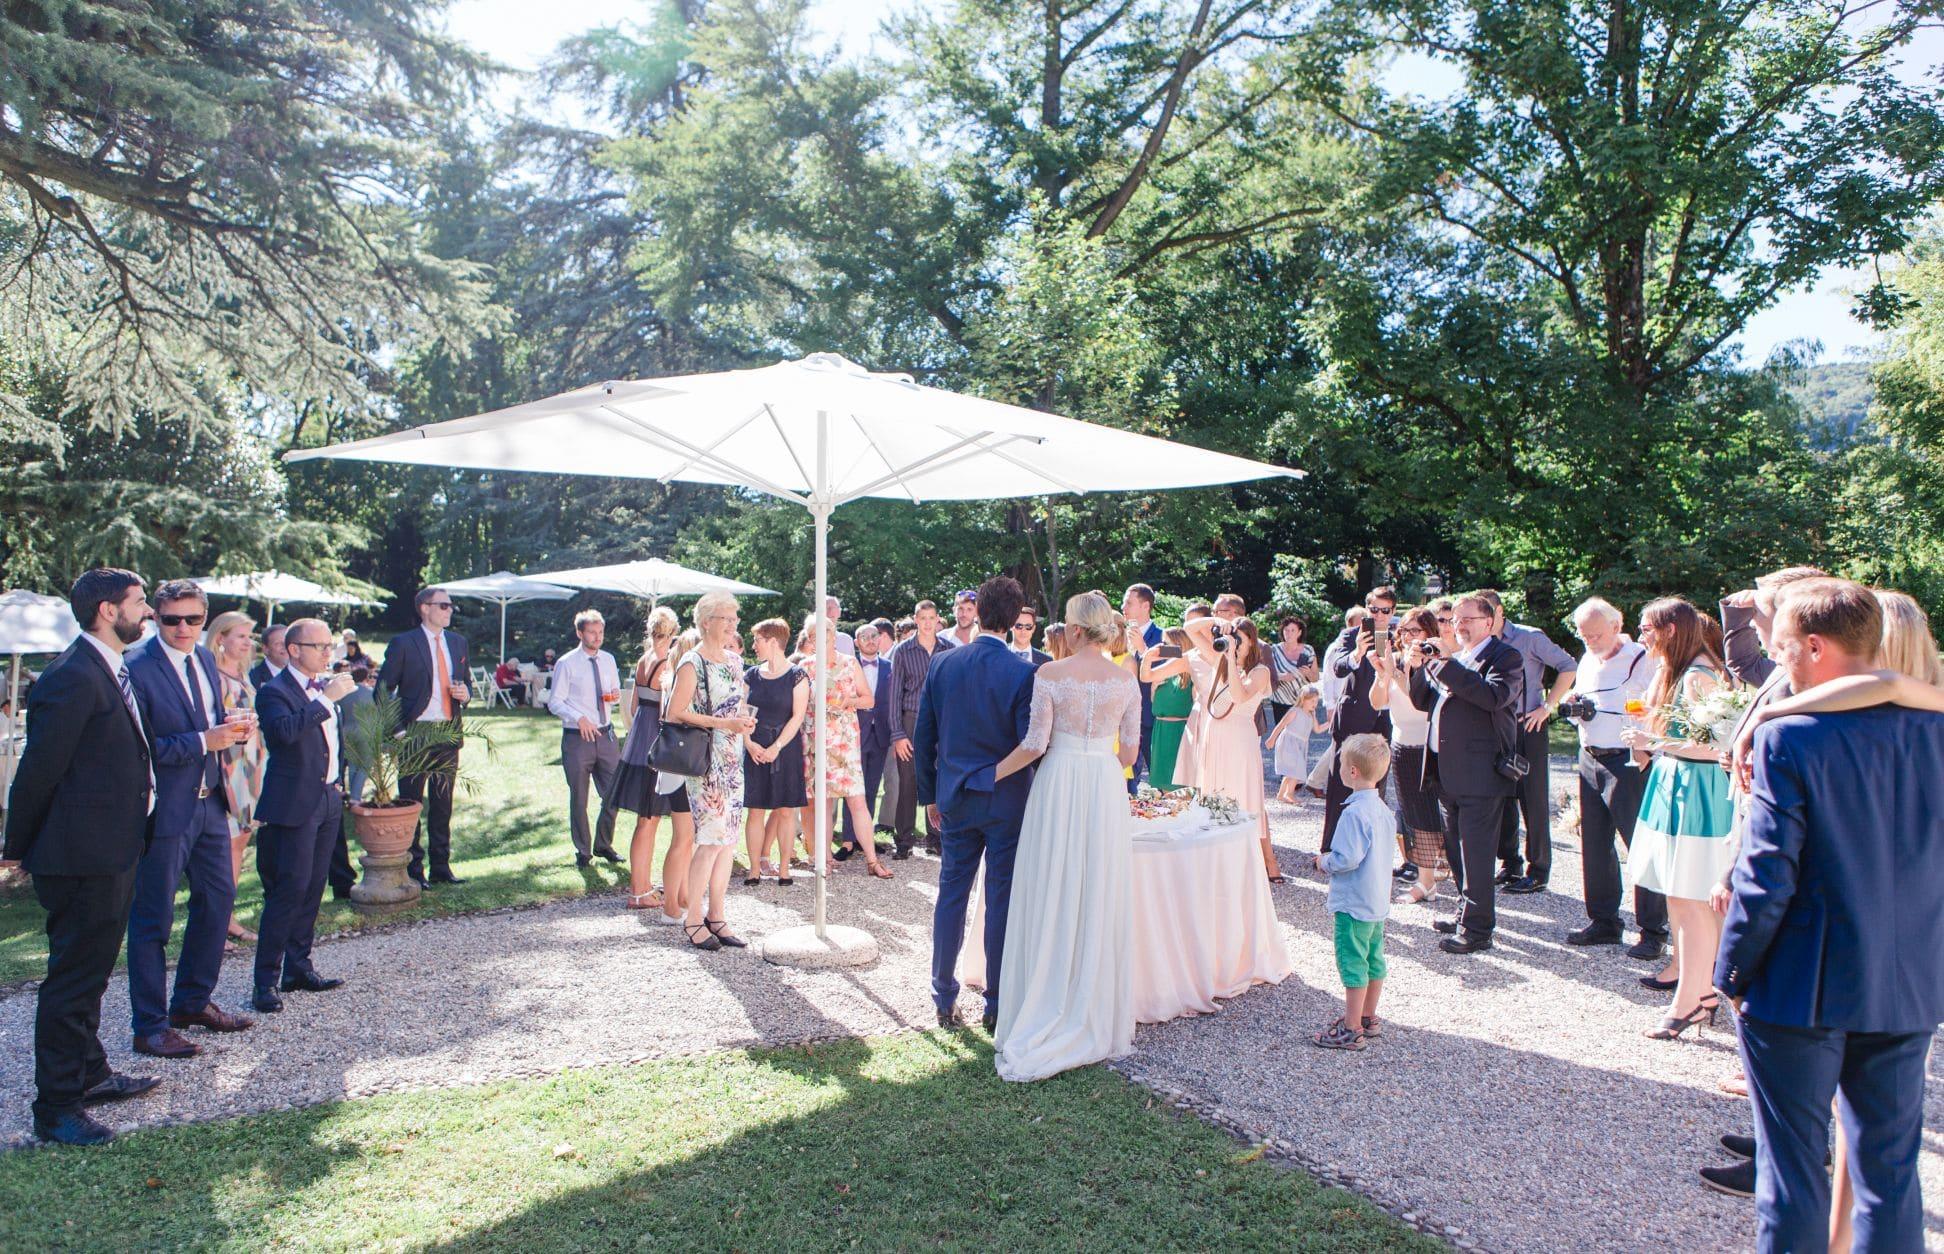 Million Memories_A&D_Hochzeitsfotograf_Schlosshochzeit_Toskana_Lago Di Como_Wedding_Tuscany_130